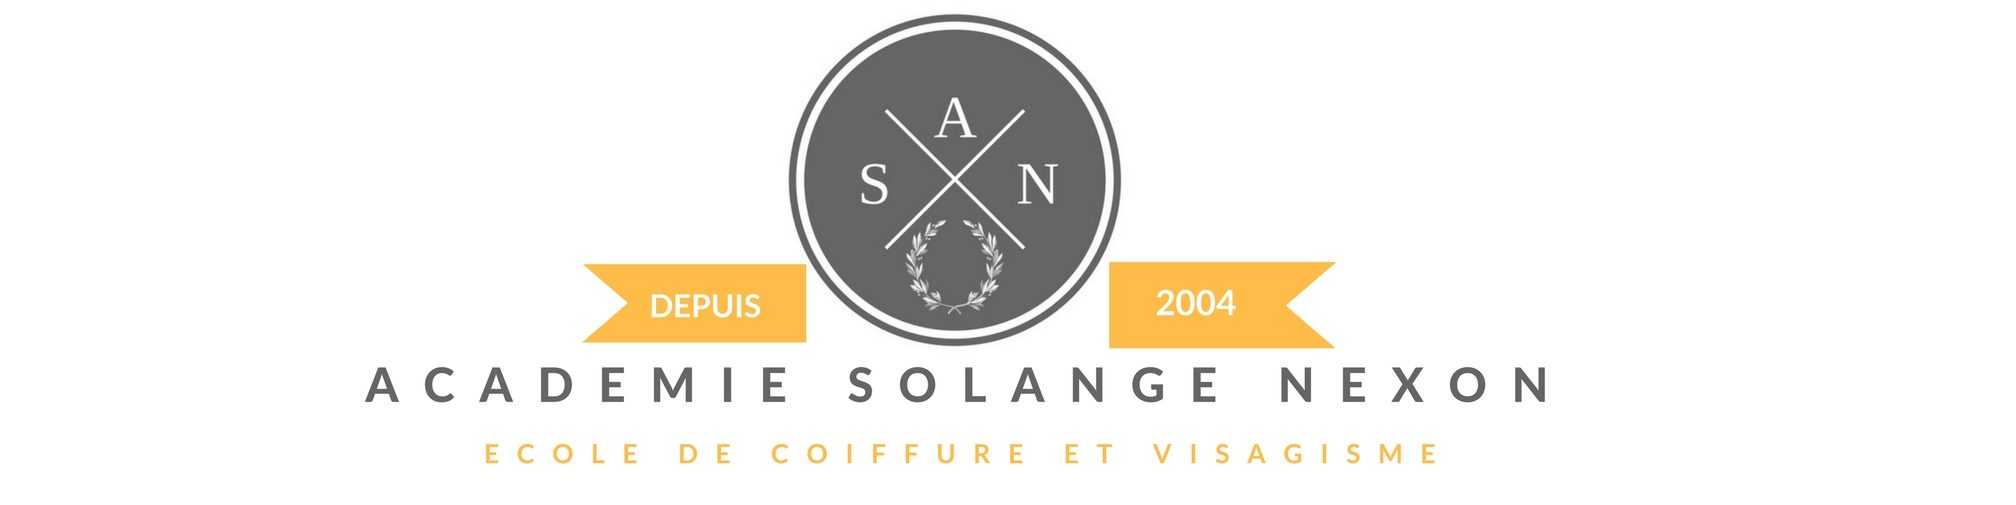 Académie Solange Nexon